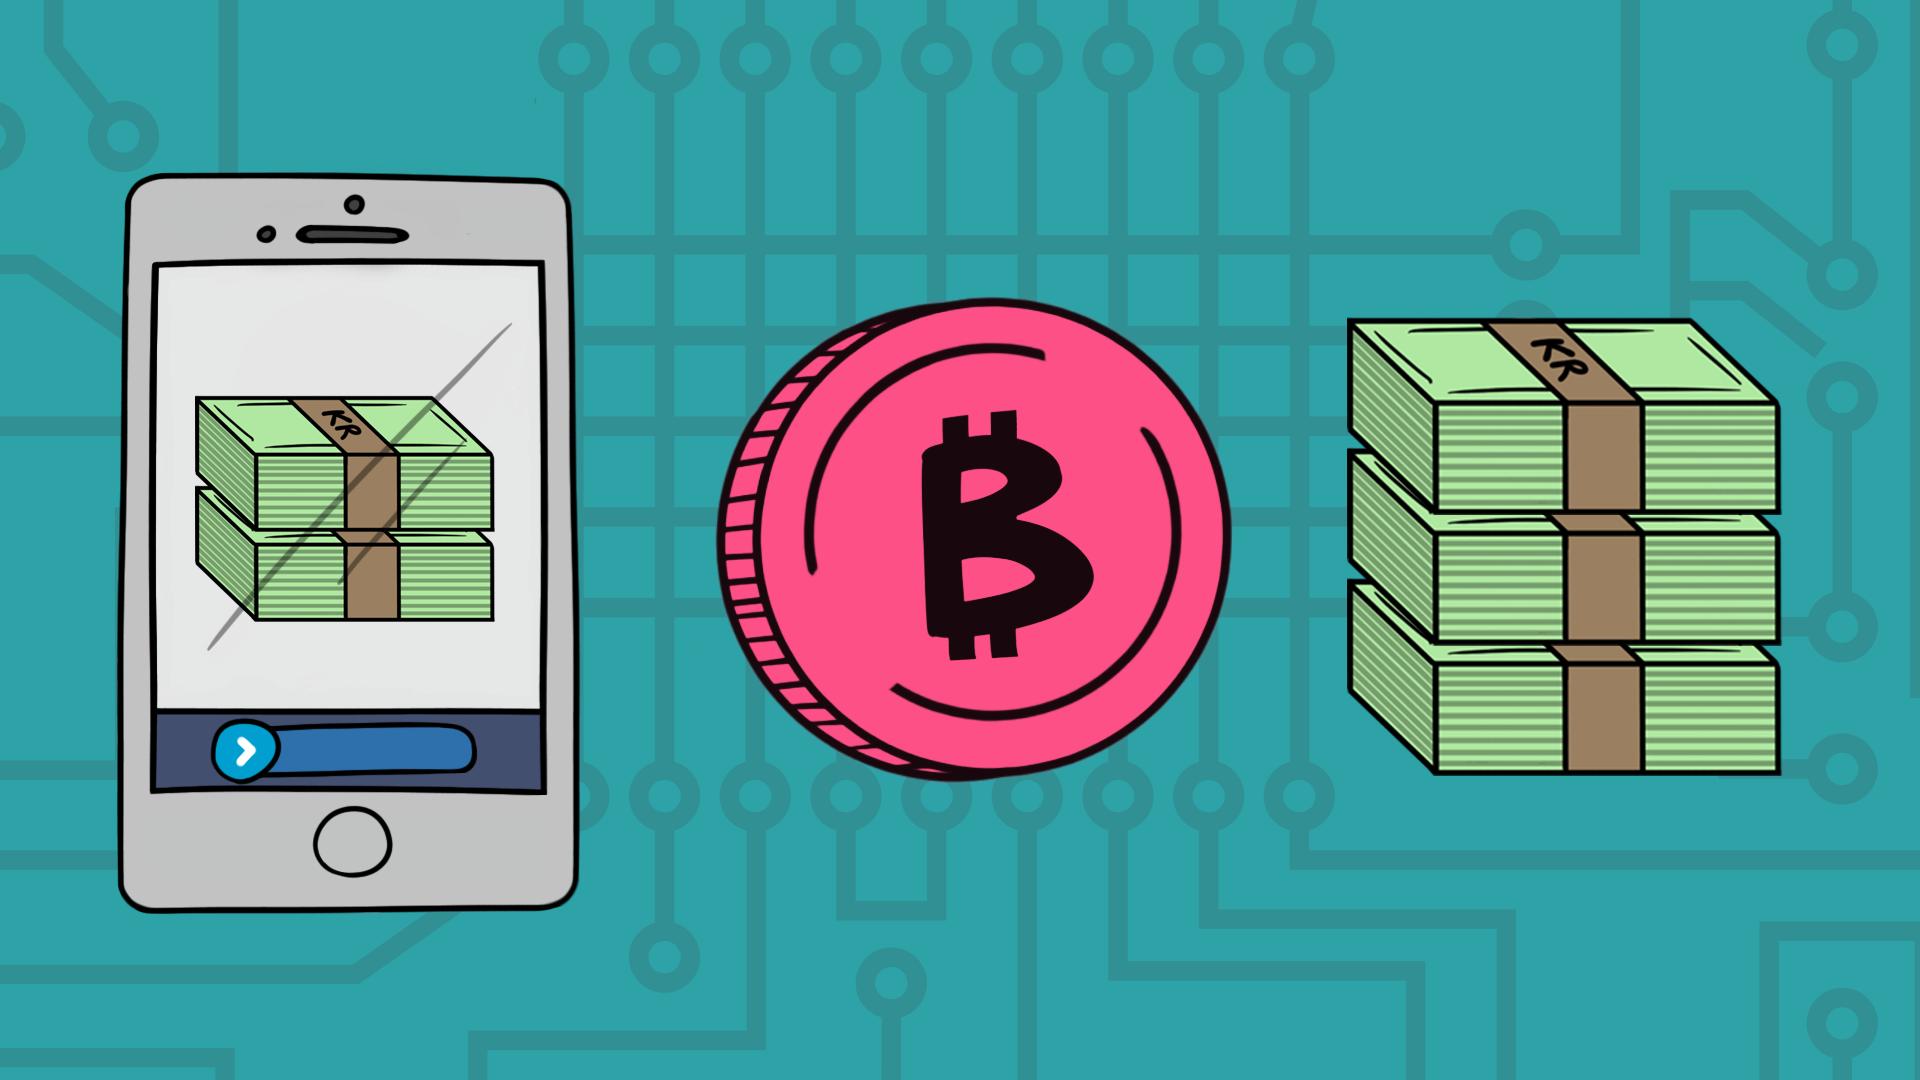 a8728a503 Jurist: Danske bitcoin-ejere er fanget i gråzone | Penge | DR